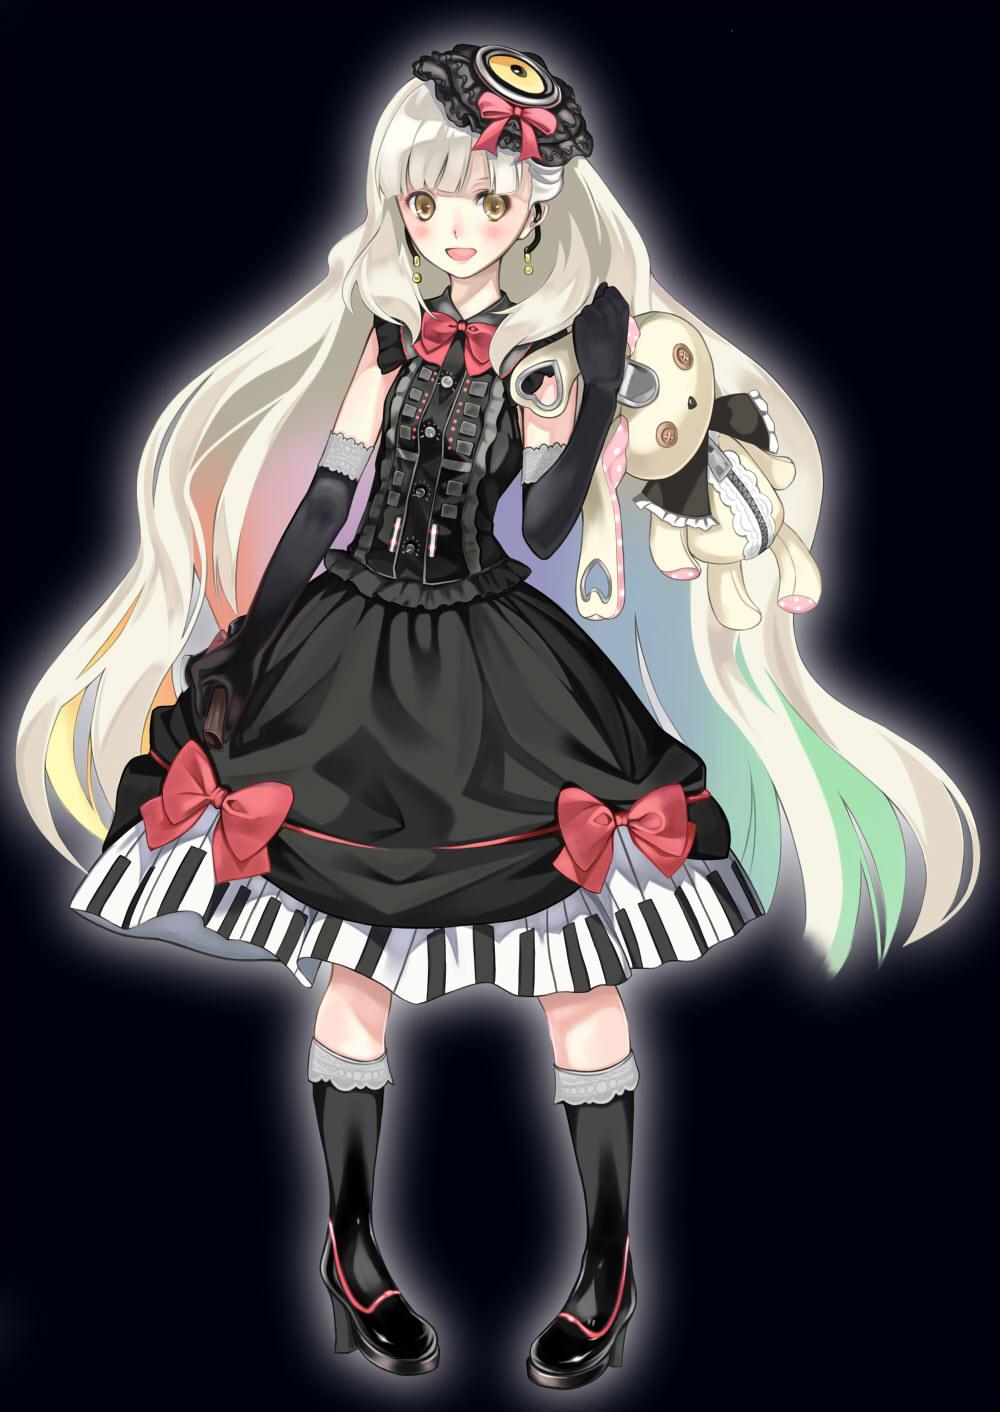 Anime Killer Girl Wallpaper Mayu Vocaloid Mobile Wallpaper 1115349 Zerochan Anime